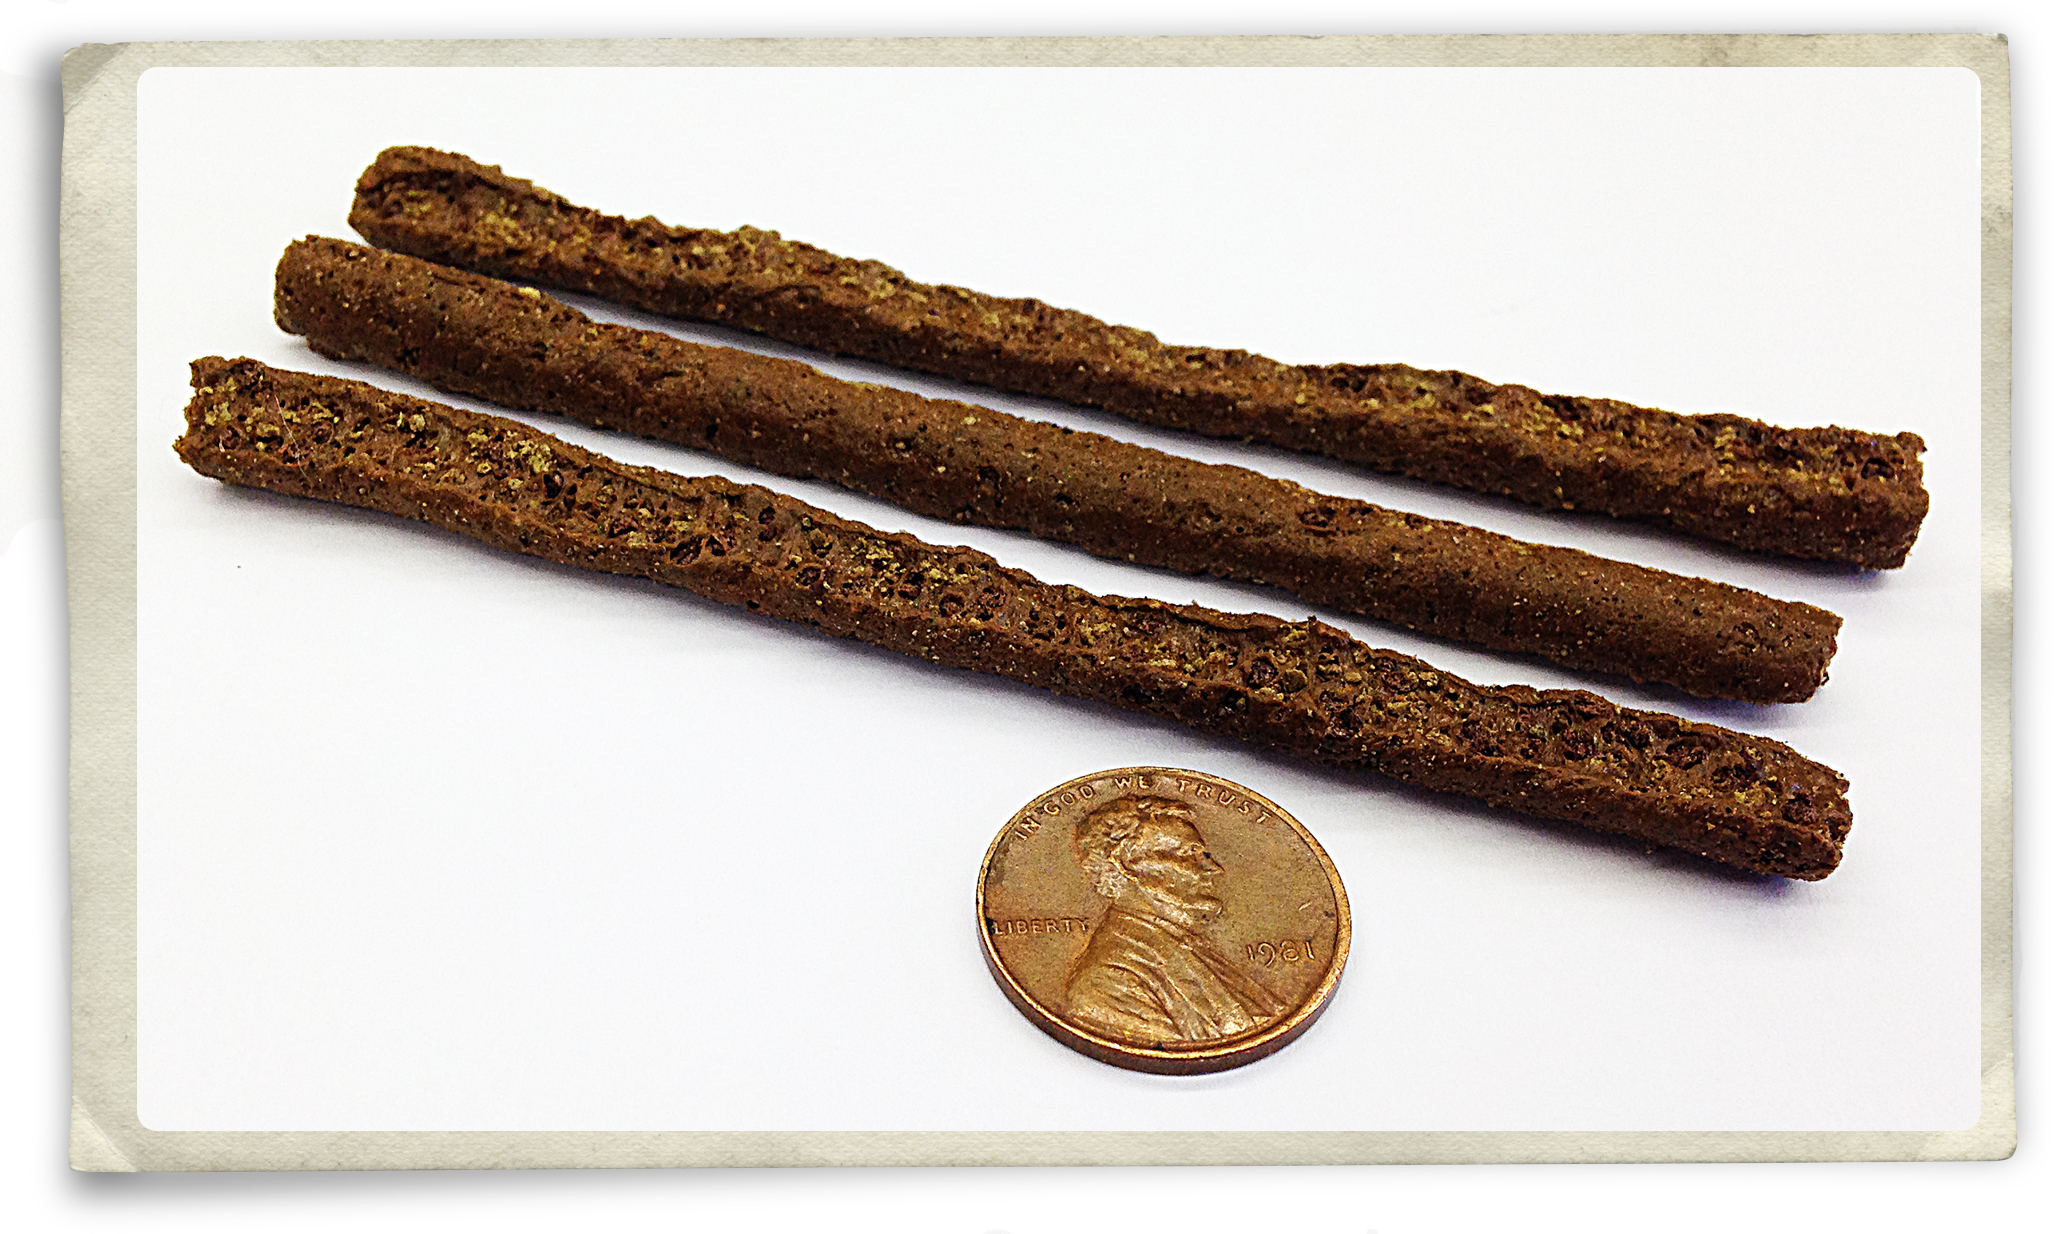 new-brn-4-inch-worms.jpg